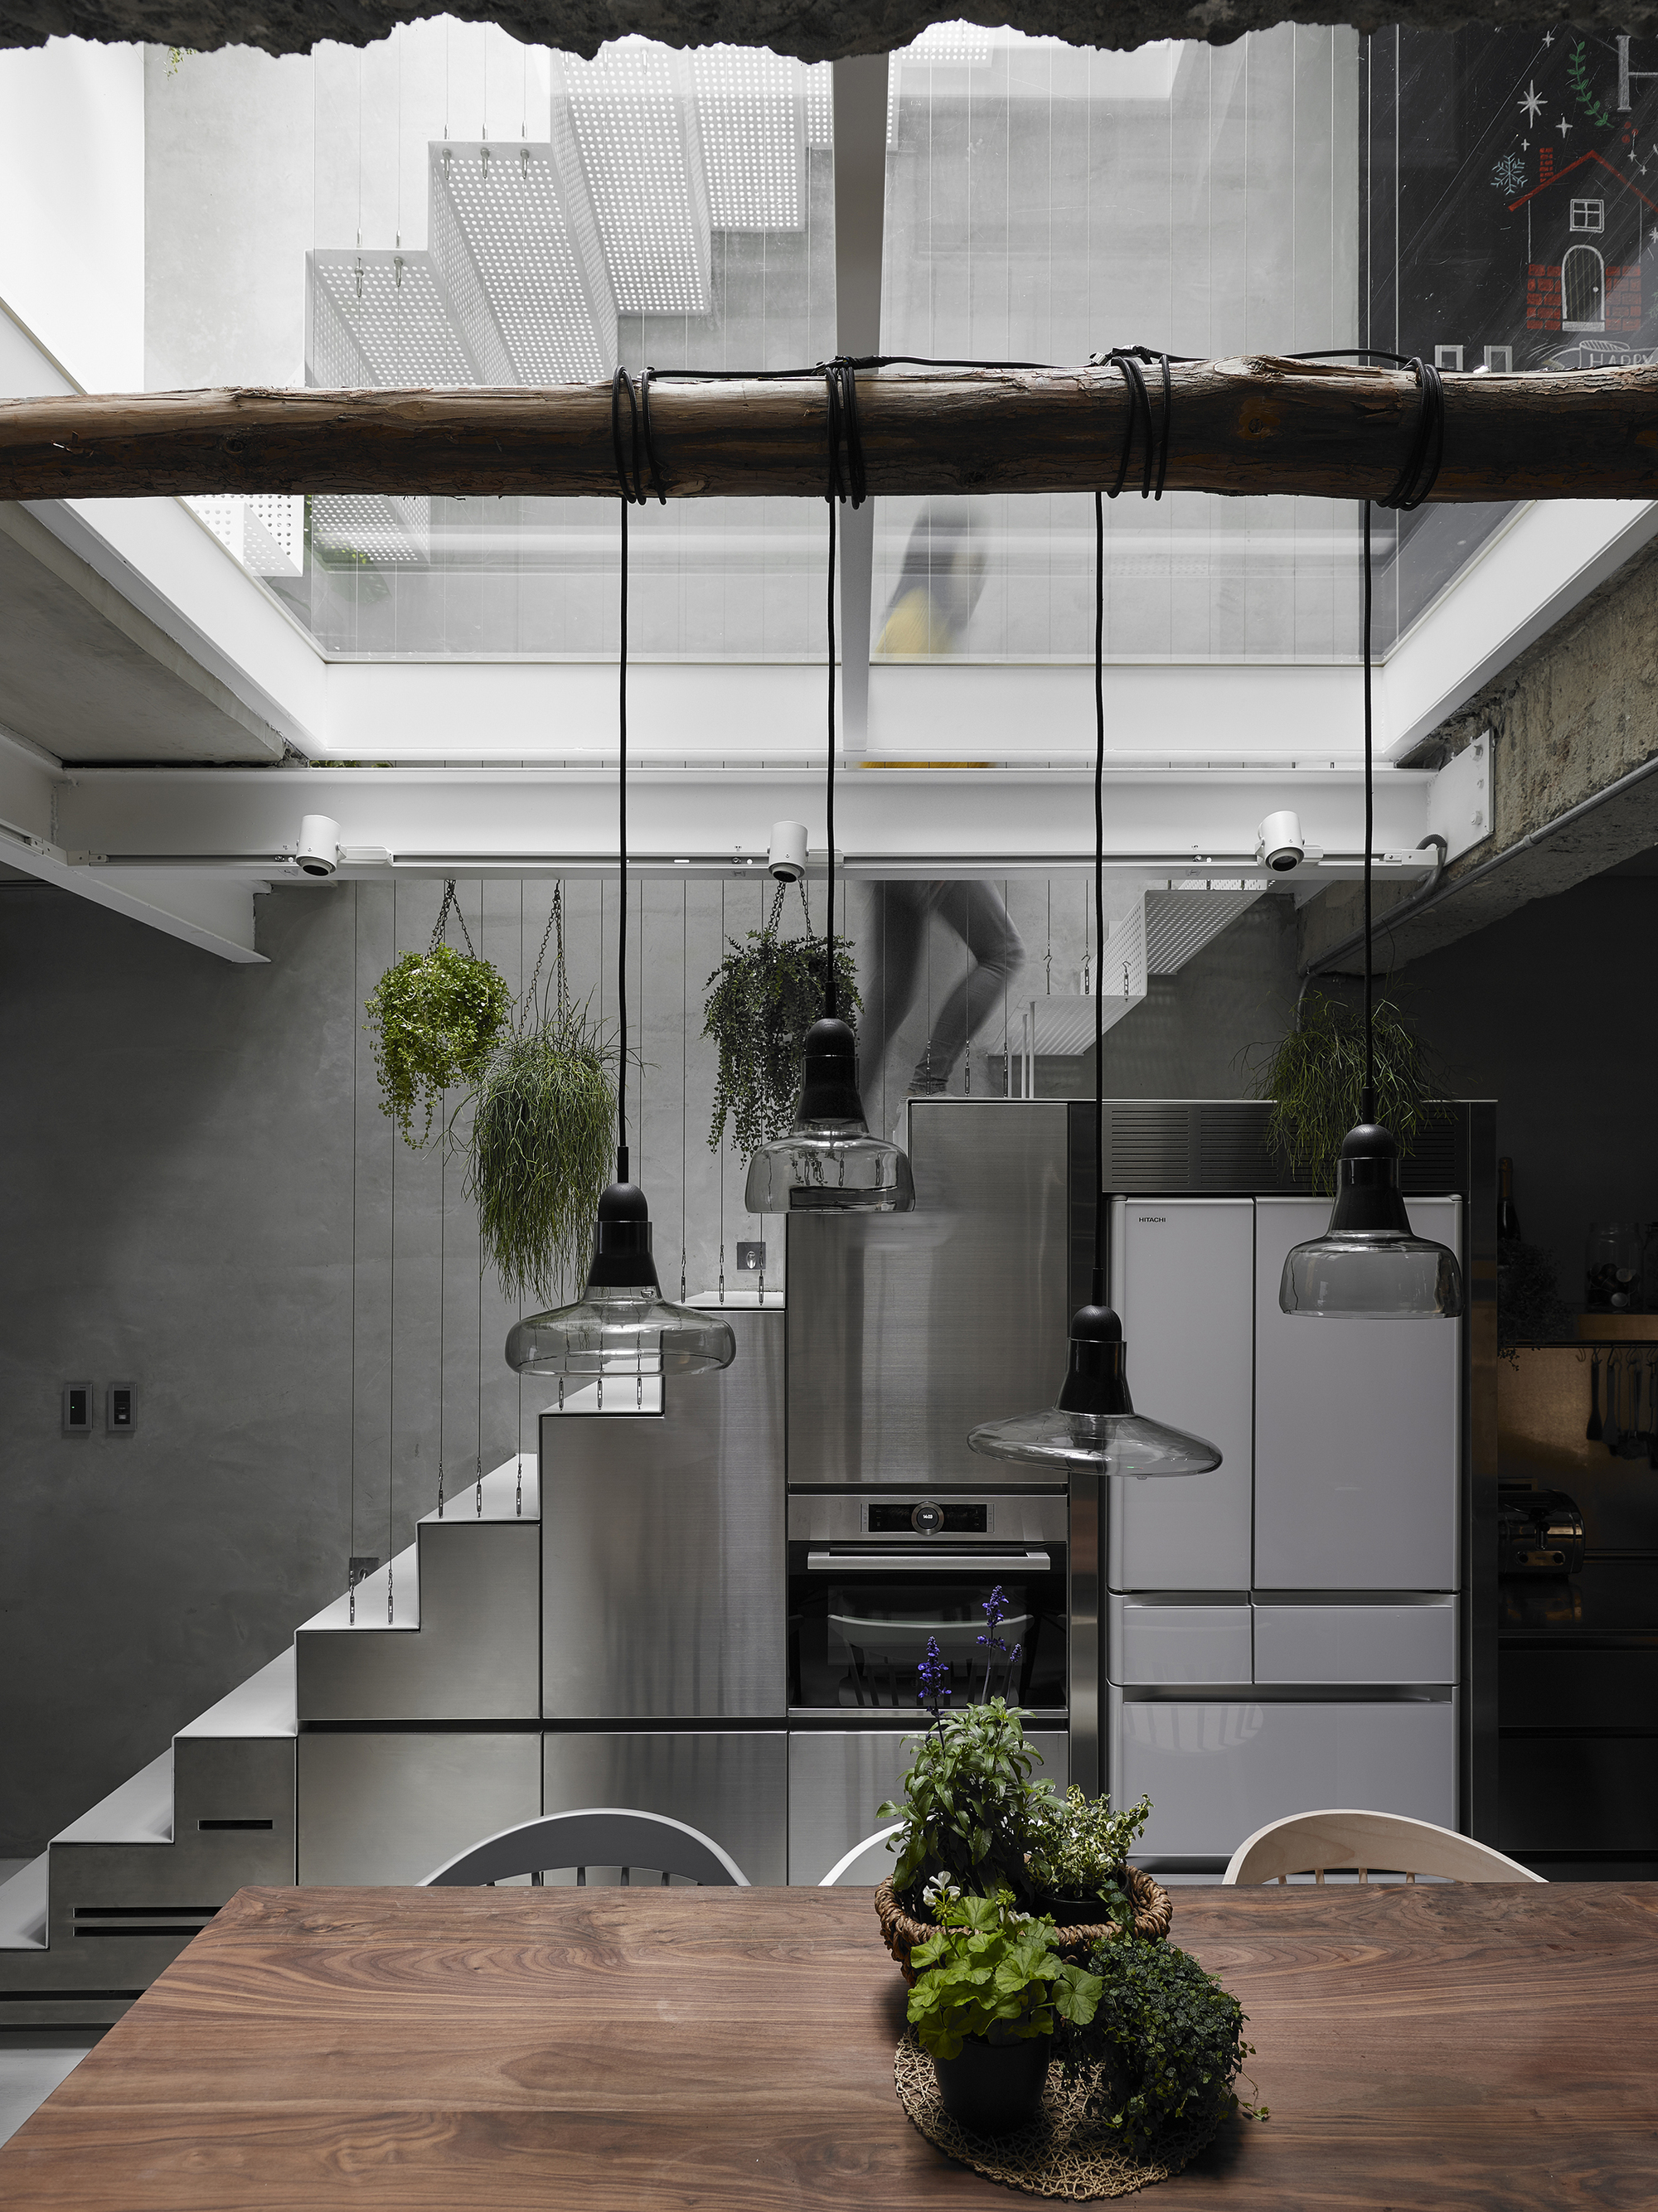 Gallery of house w kc design studio 22 for Design homes kc